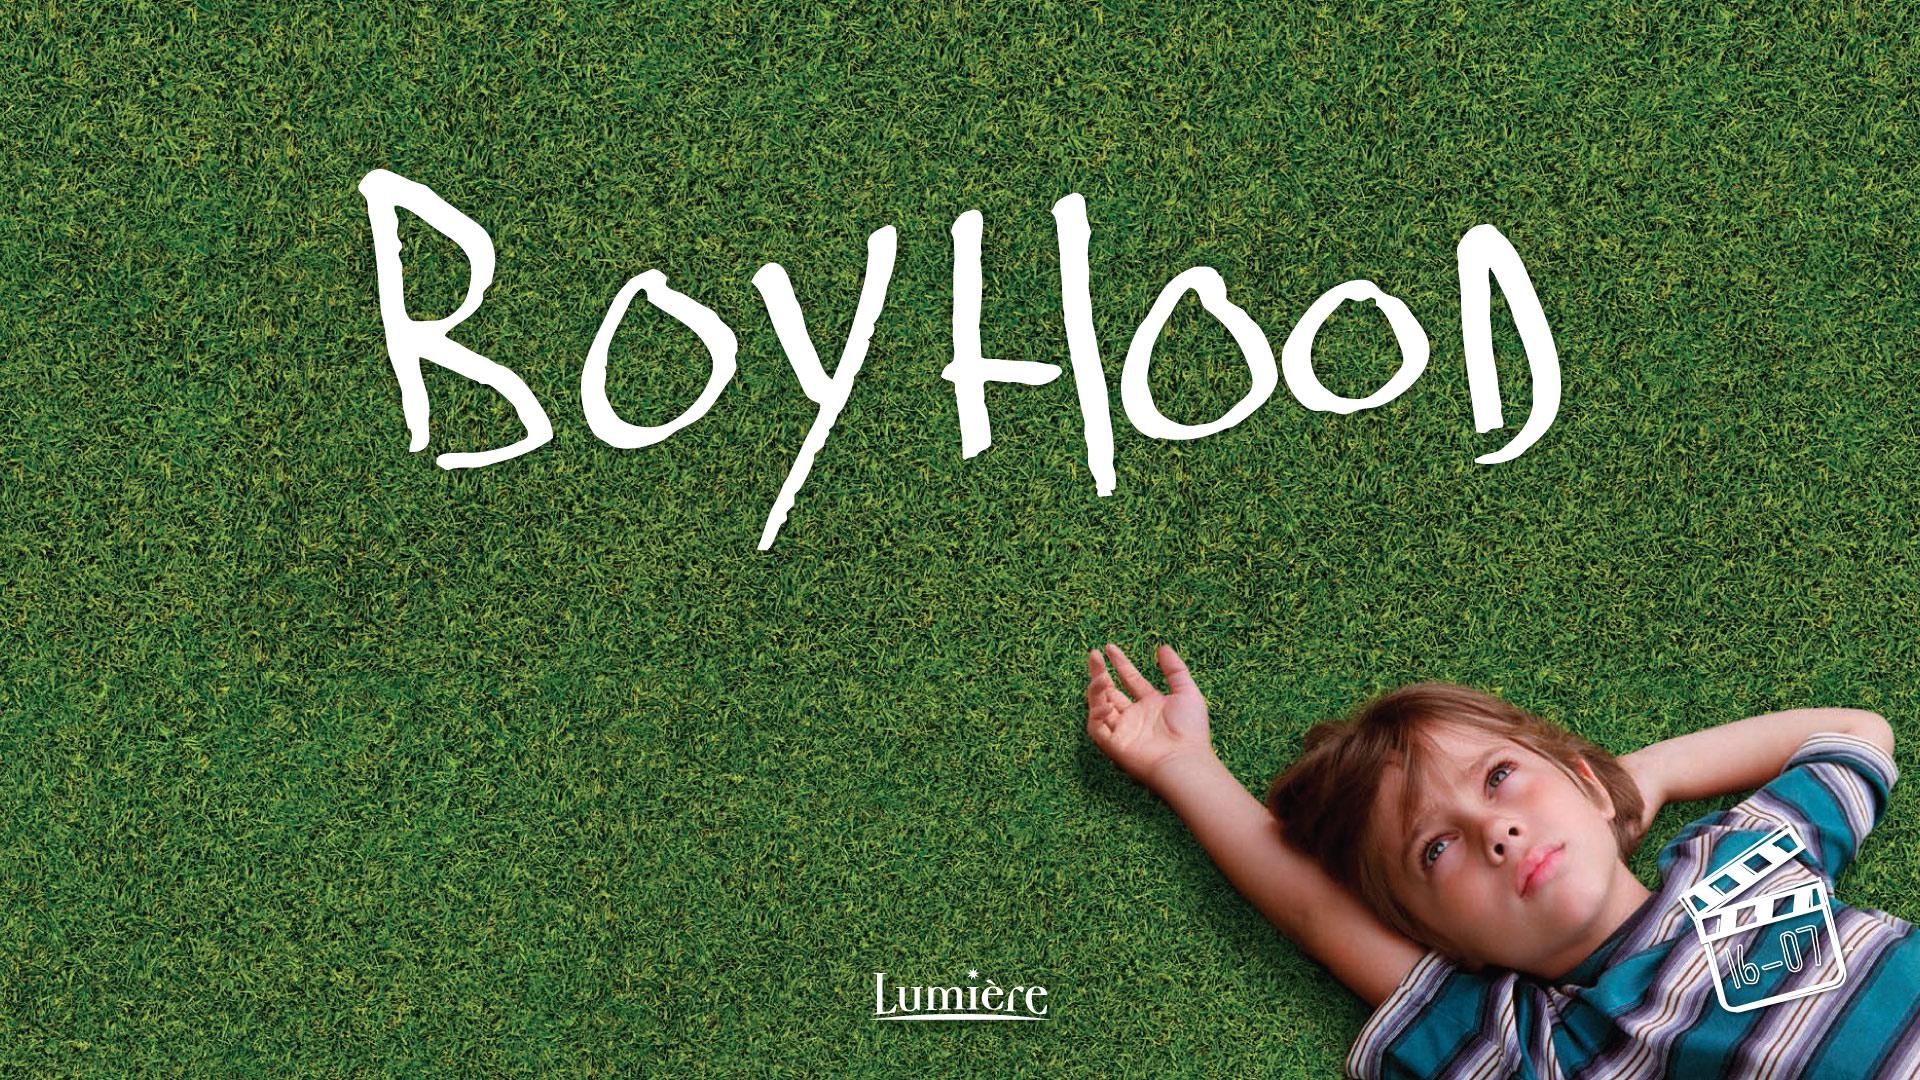 Boyhood is overrated like gravity